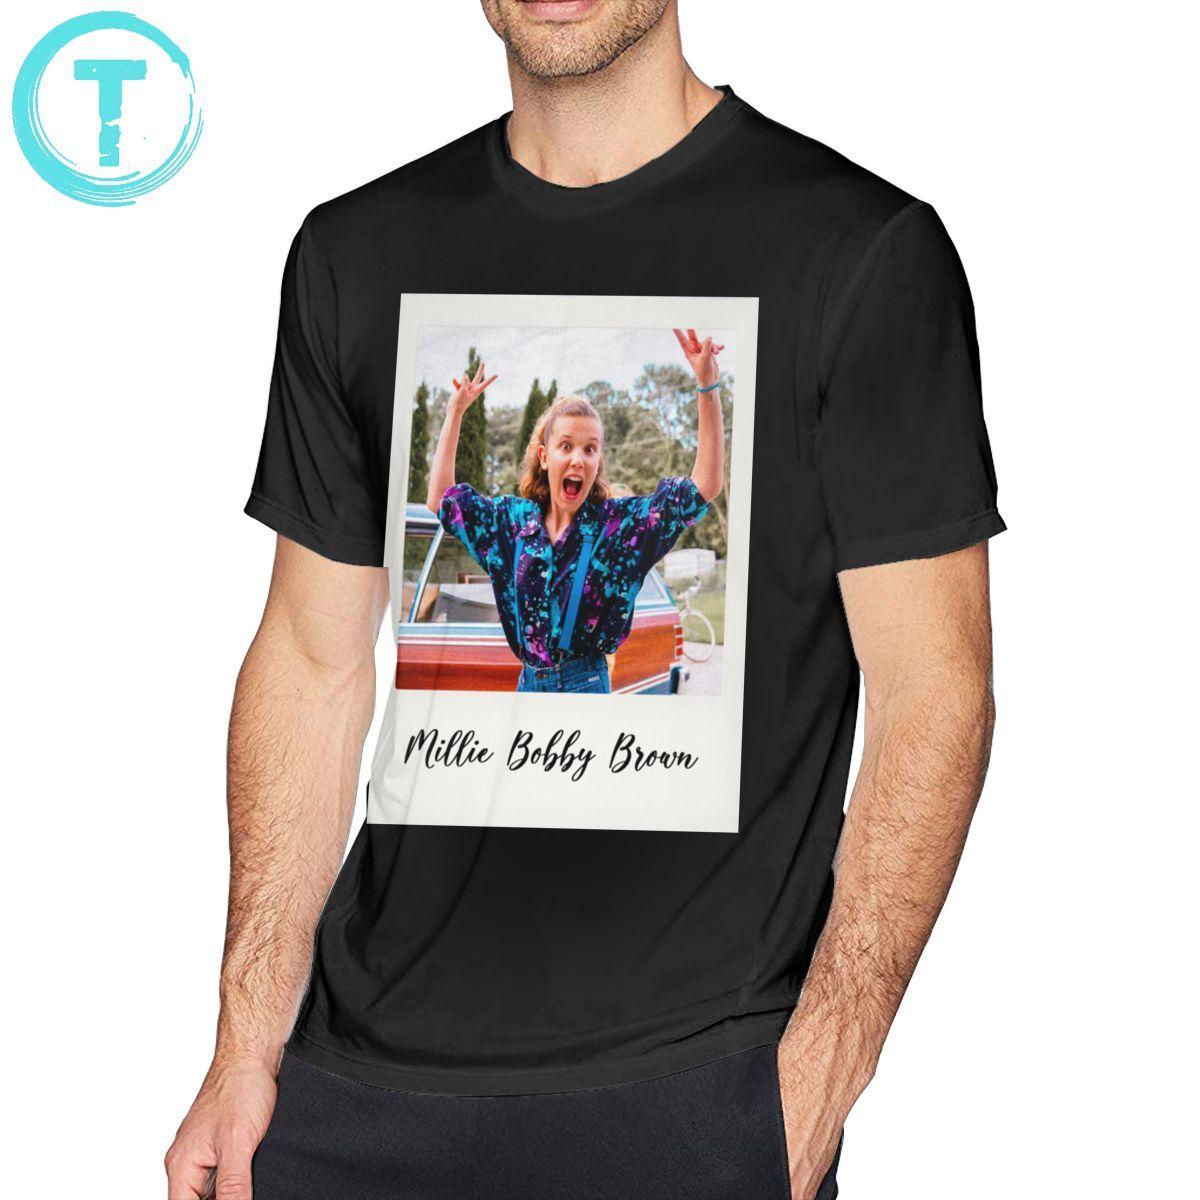 Millie Bobby Brown T Shirt Millie Bobby Brown Polaroid T Shirt Basic Short Sleeves Tee Shirt Plus Size Tshirt T Shirts Aliexpress